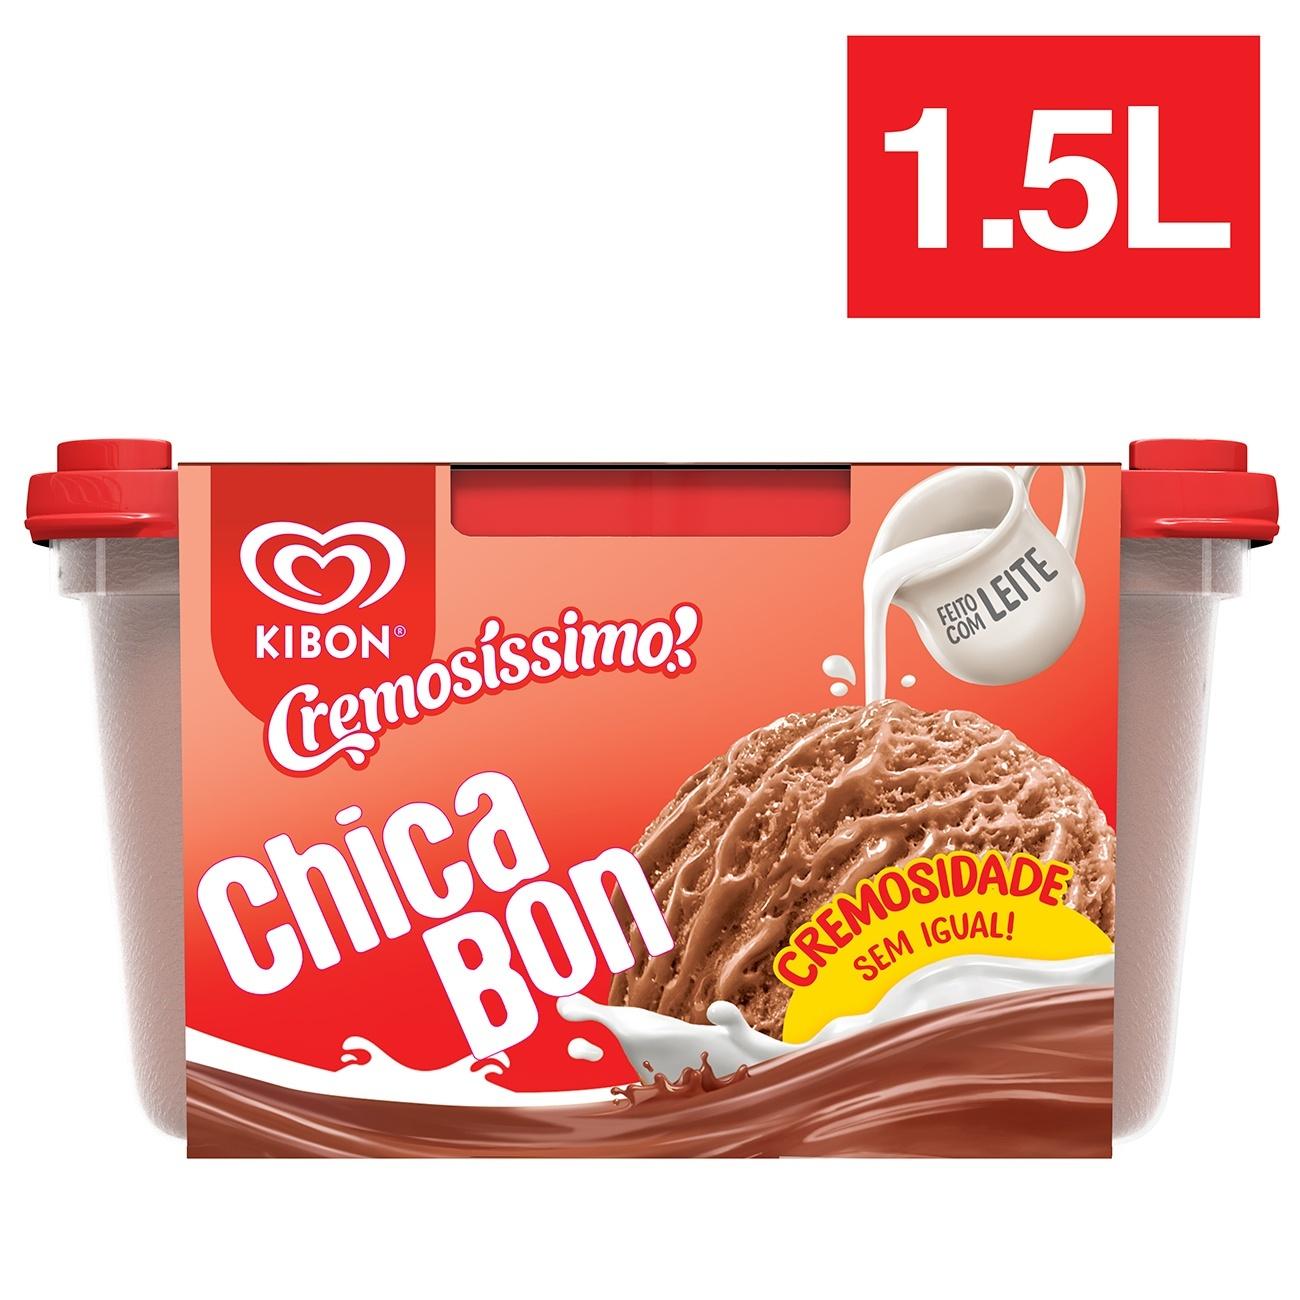 Sorvete Pote Kibon Cremos�ssimo Chicabon 1,5L